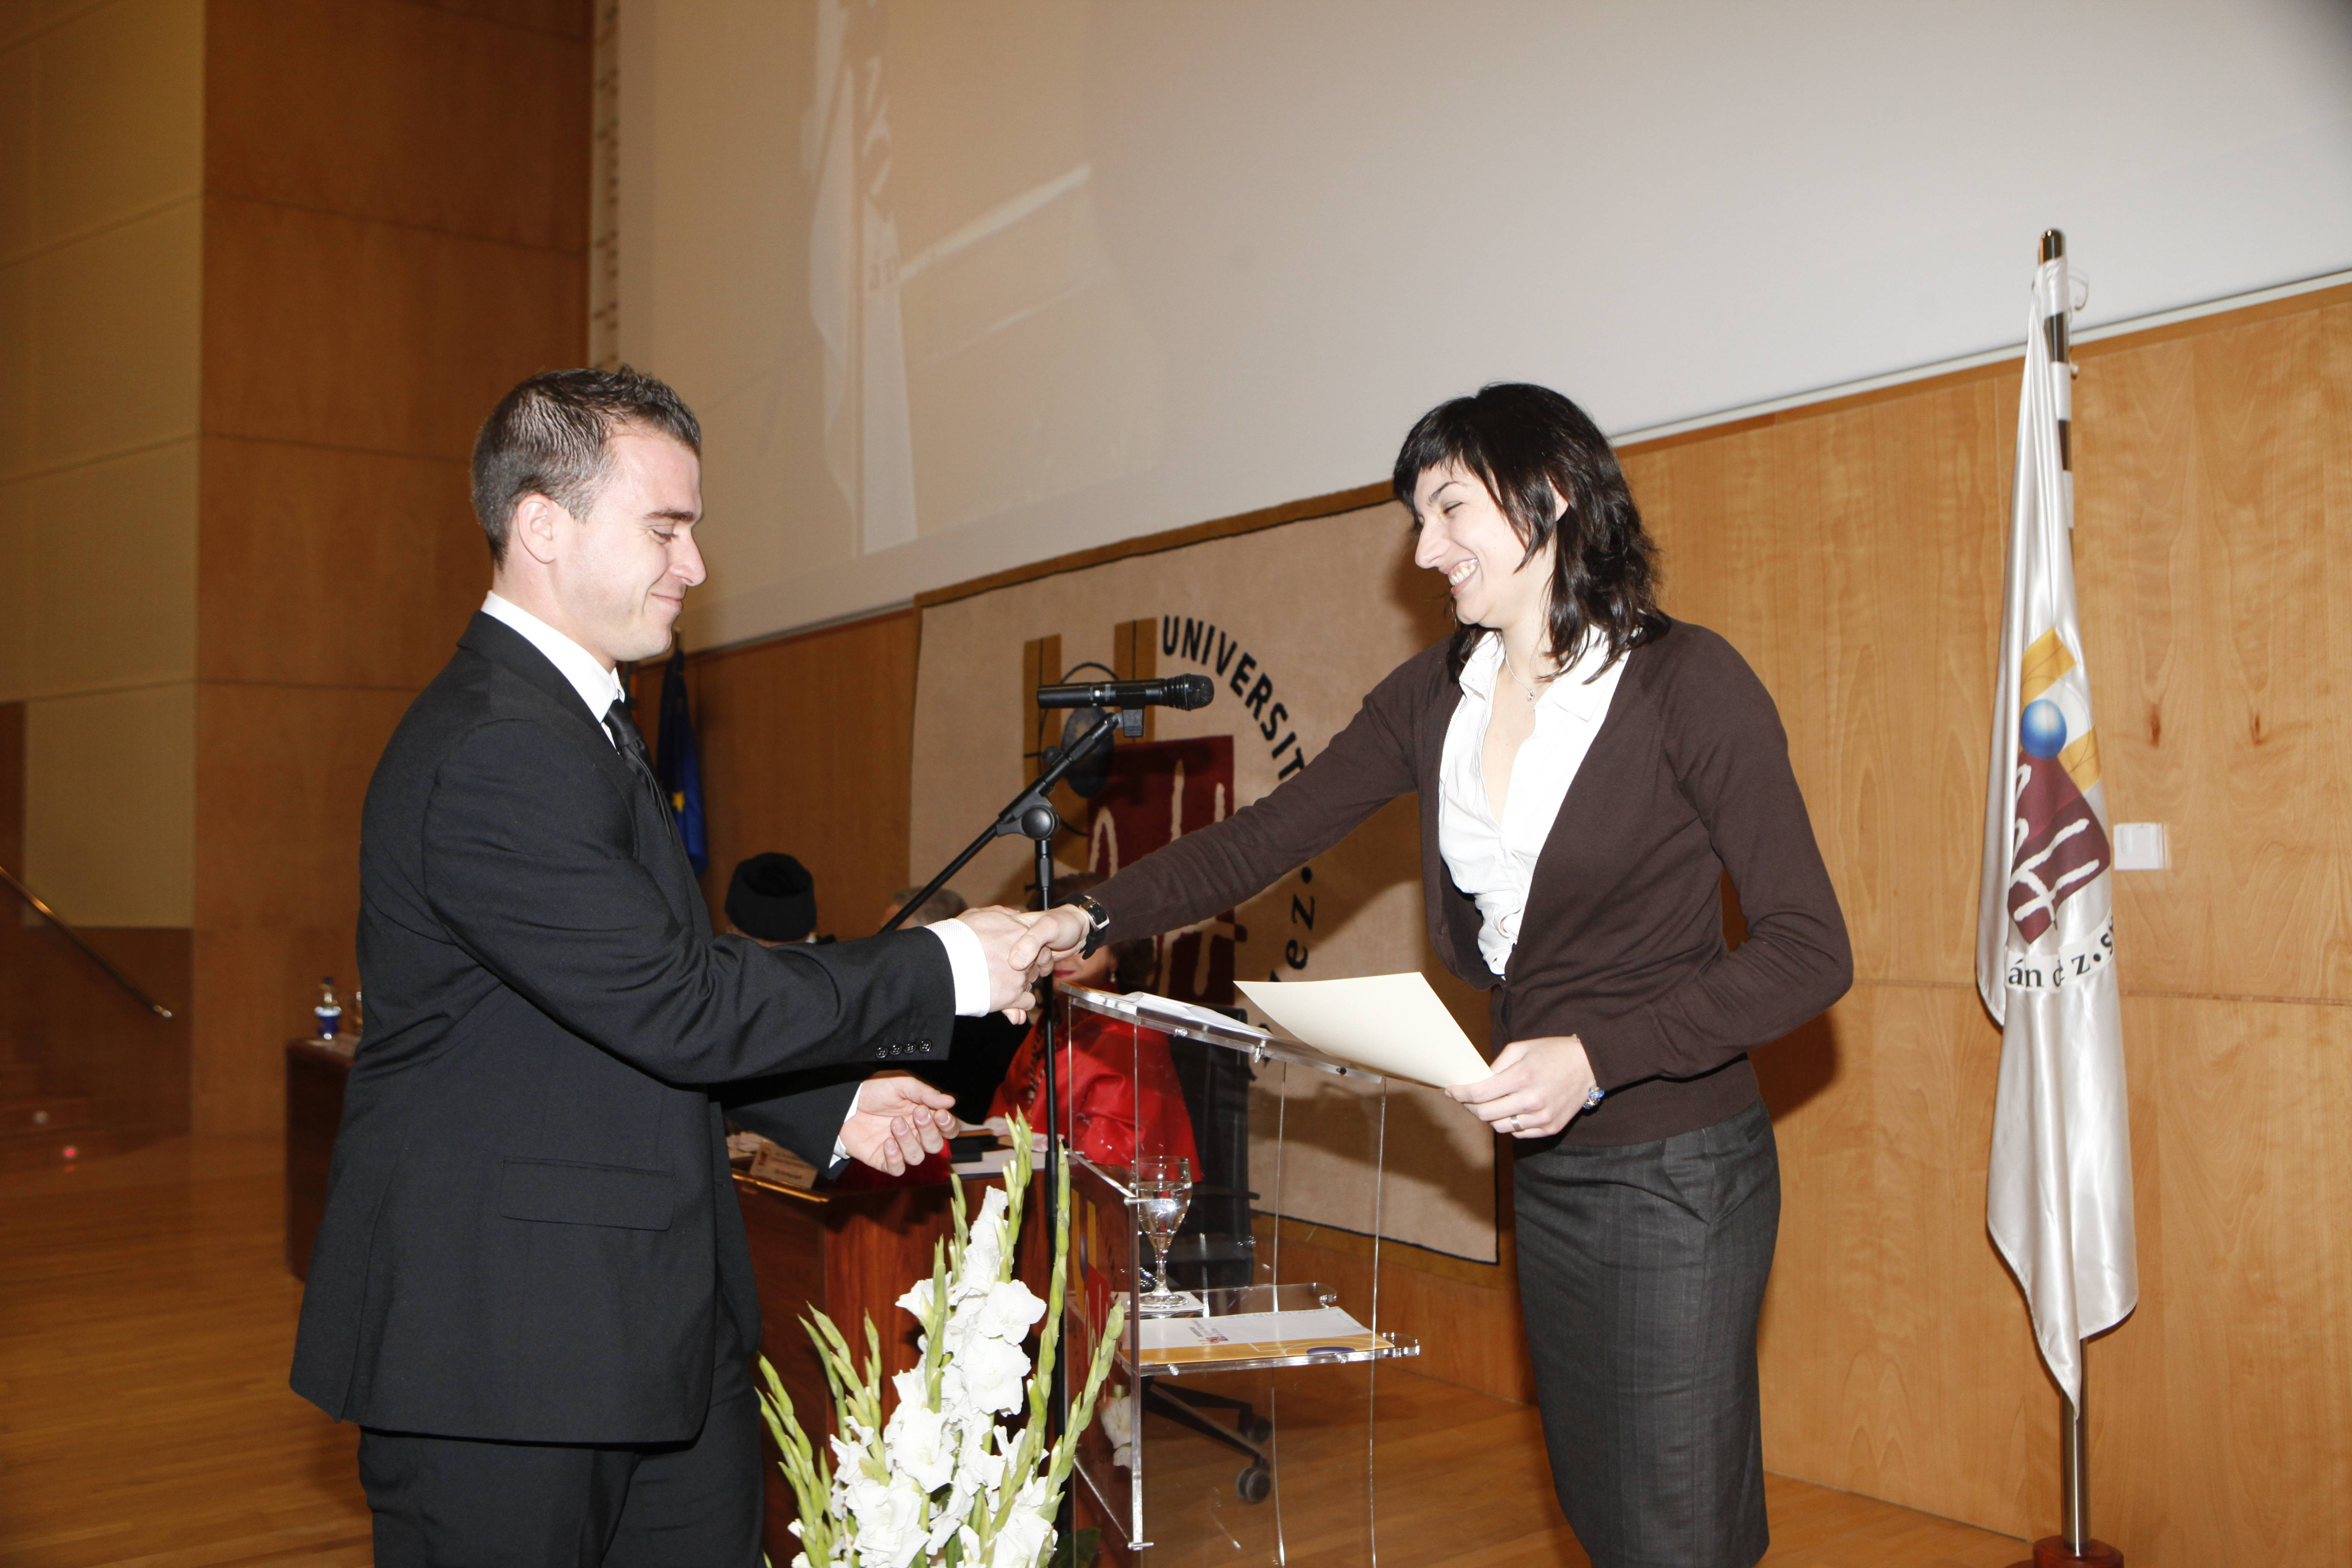 doctor-honoris-causa-luis-gamir_mg_0996.jpg